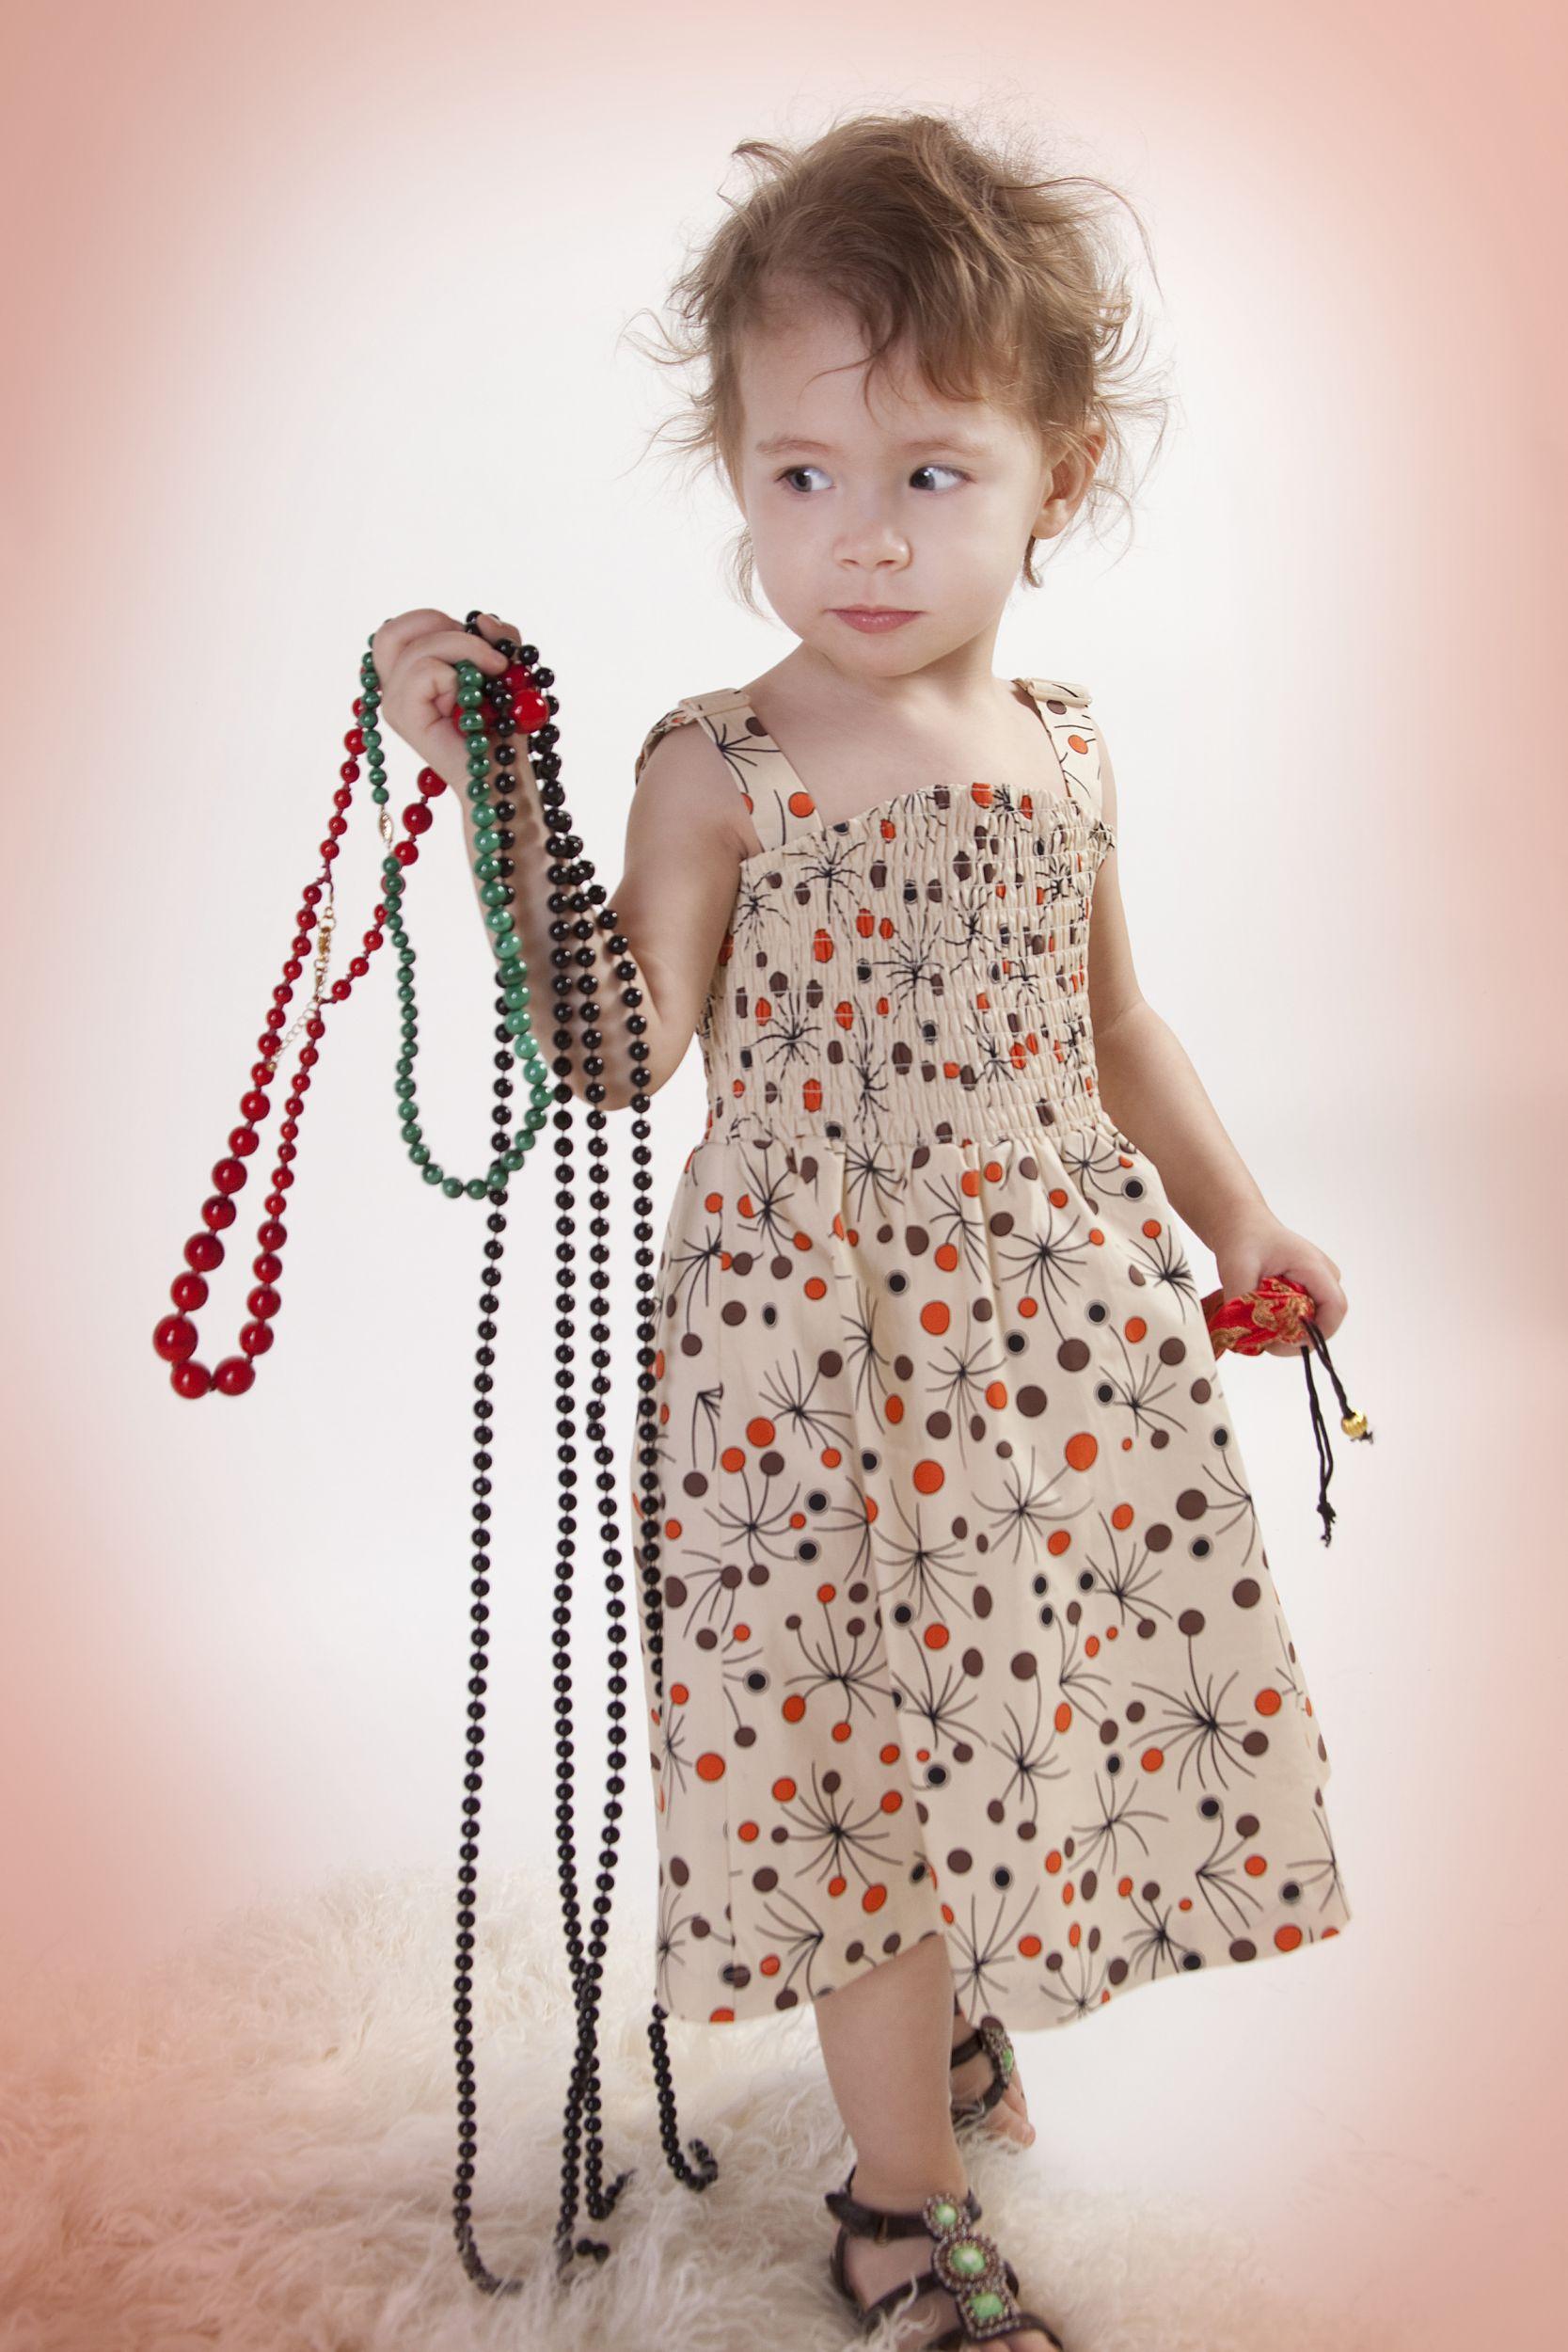 Infant vintage clothes confirm. agree